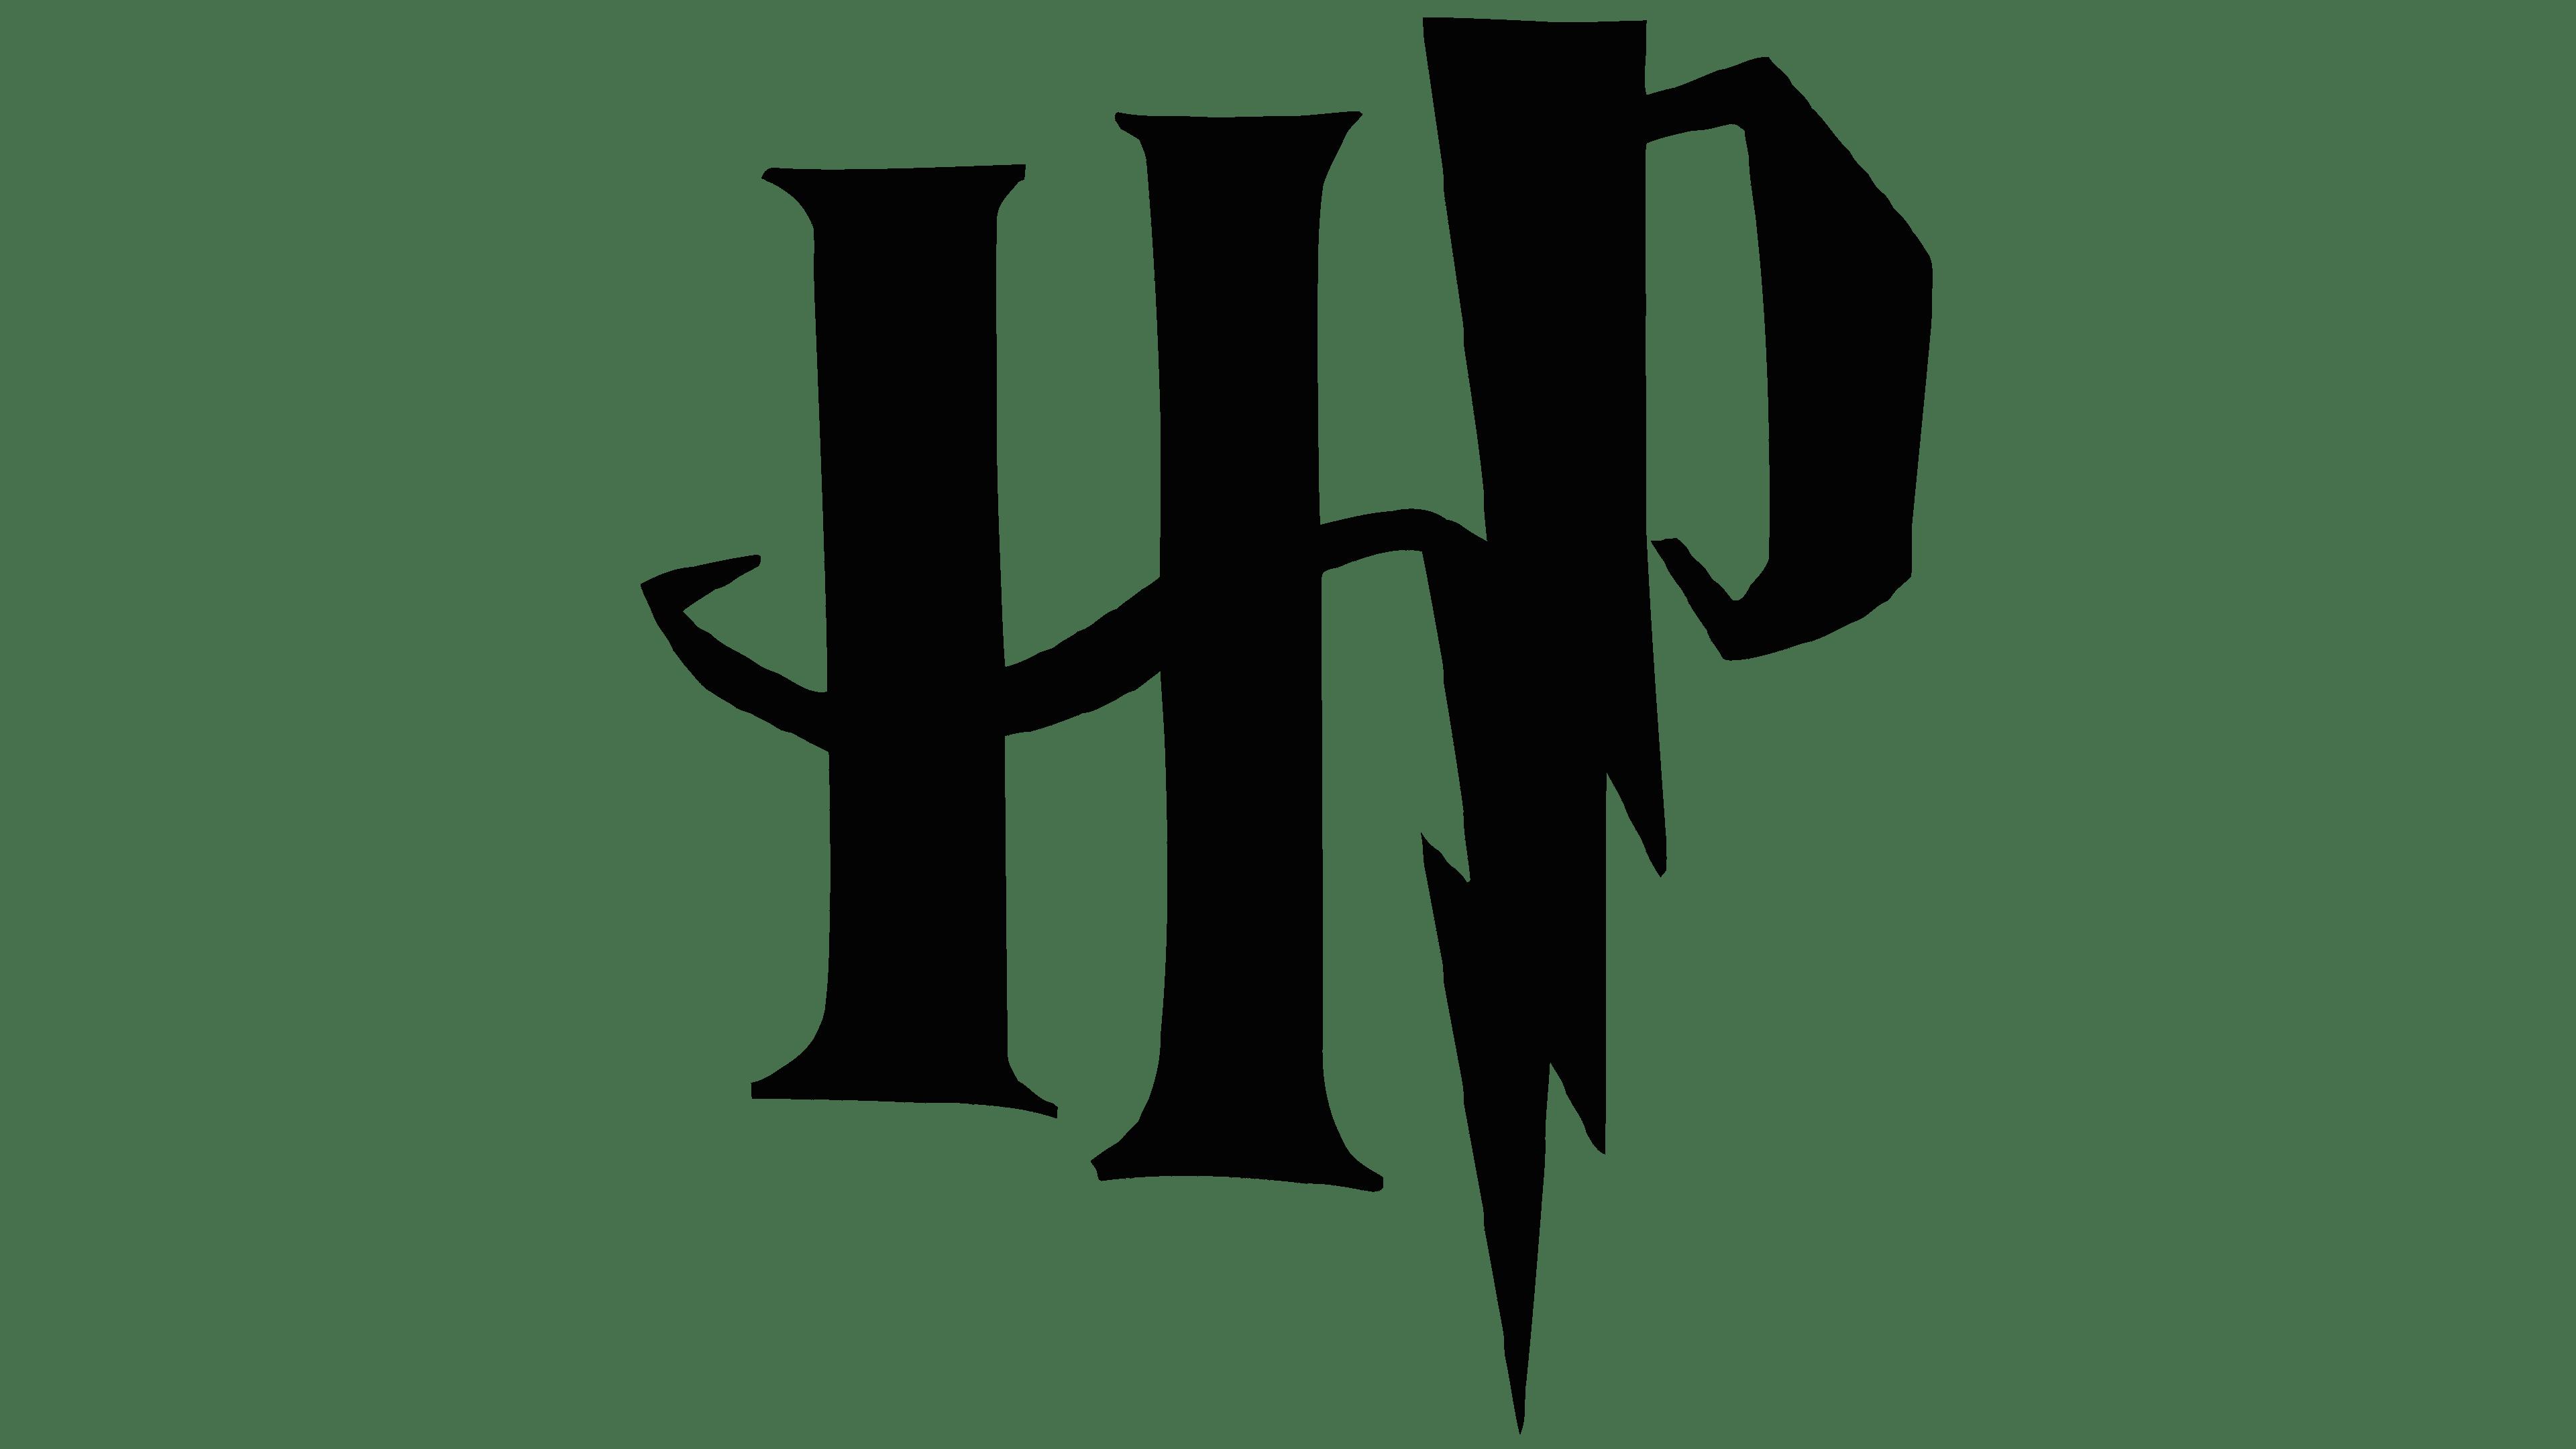 Harry Potter Emblem